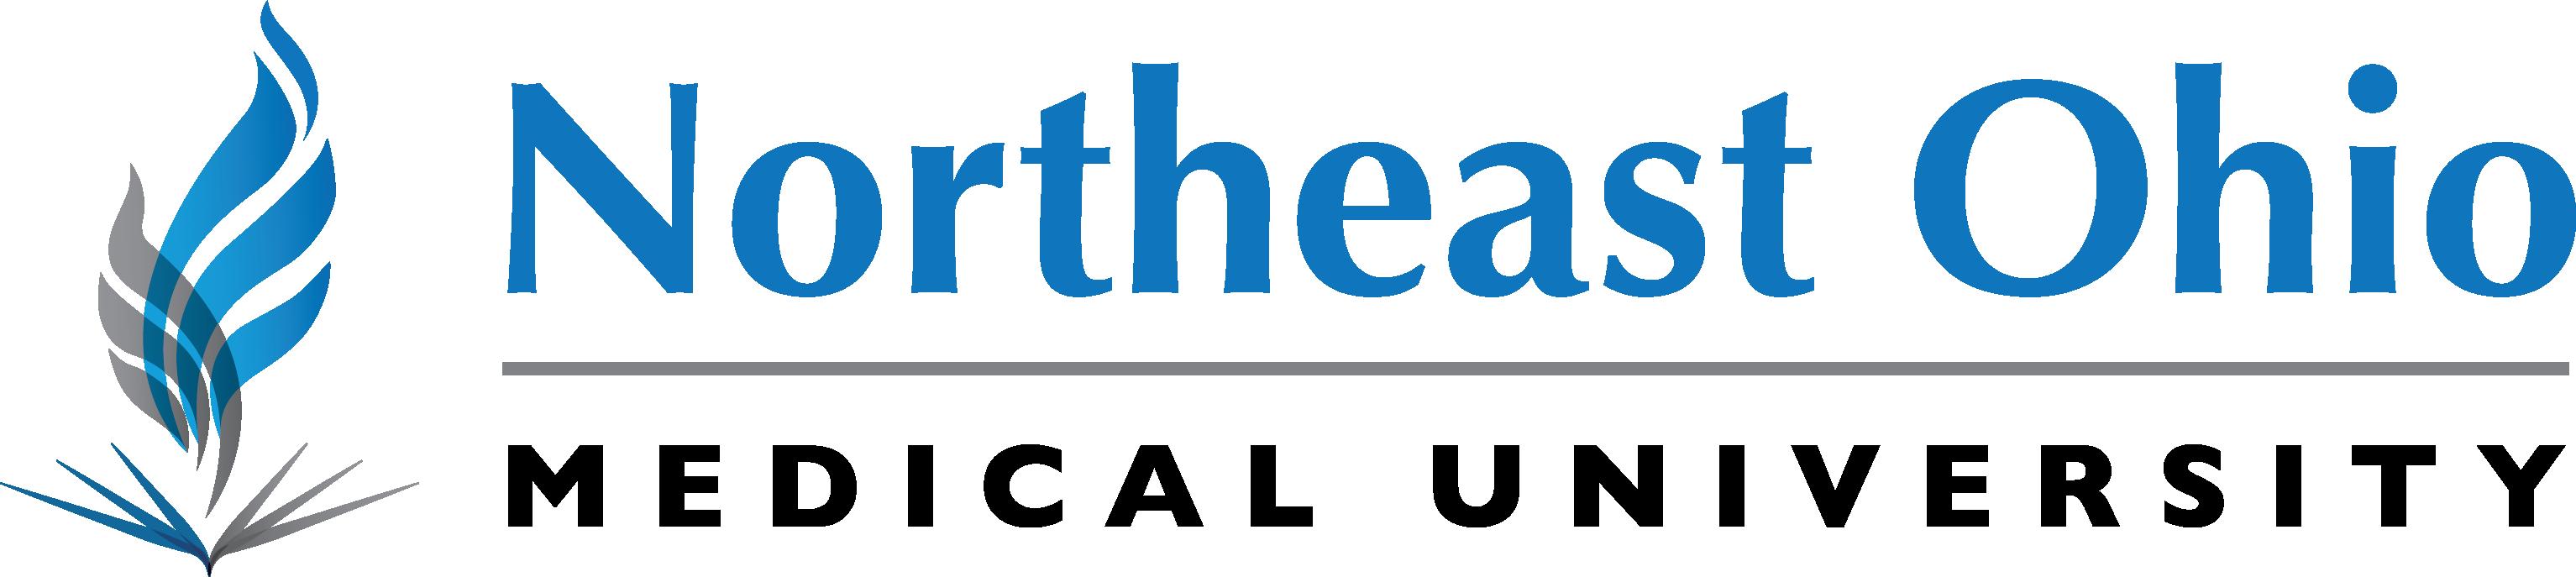 Northeast Ohio Medical University (NEOMED) Logo